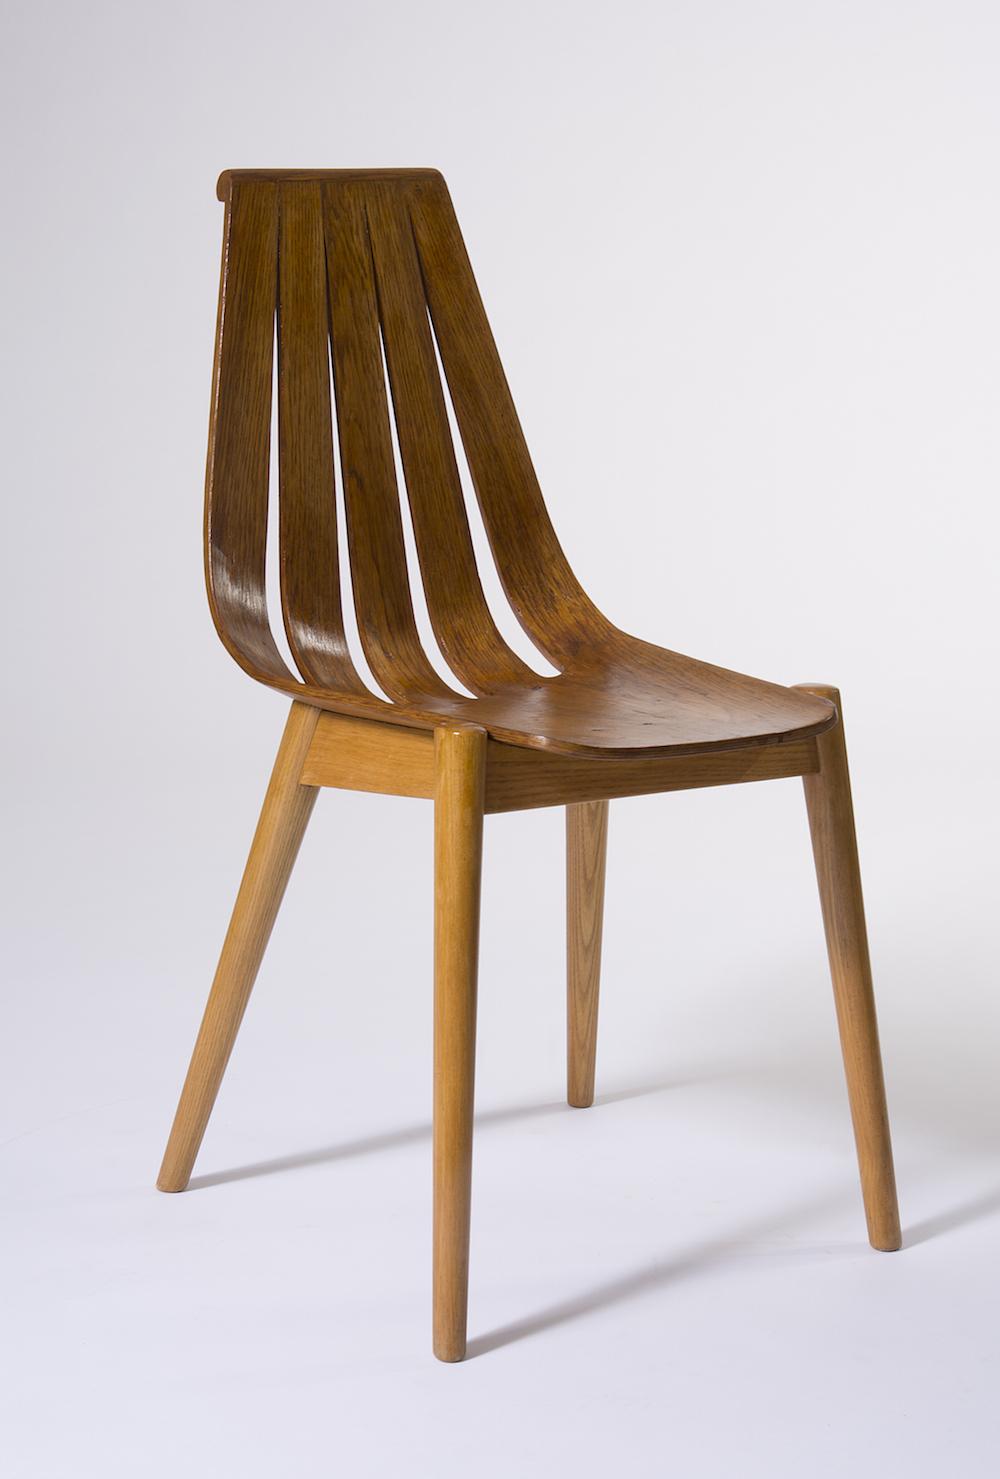 3. Wincze, krzeslo z gietej sklejki, ok. 1960, fot. Stanislaw Sielicki